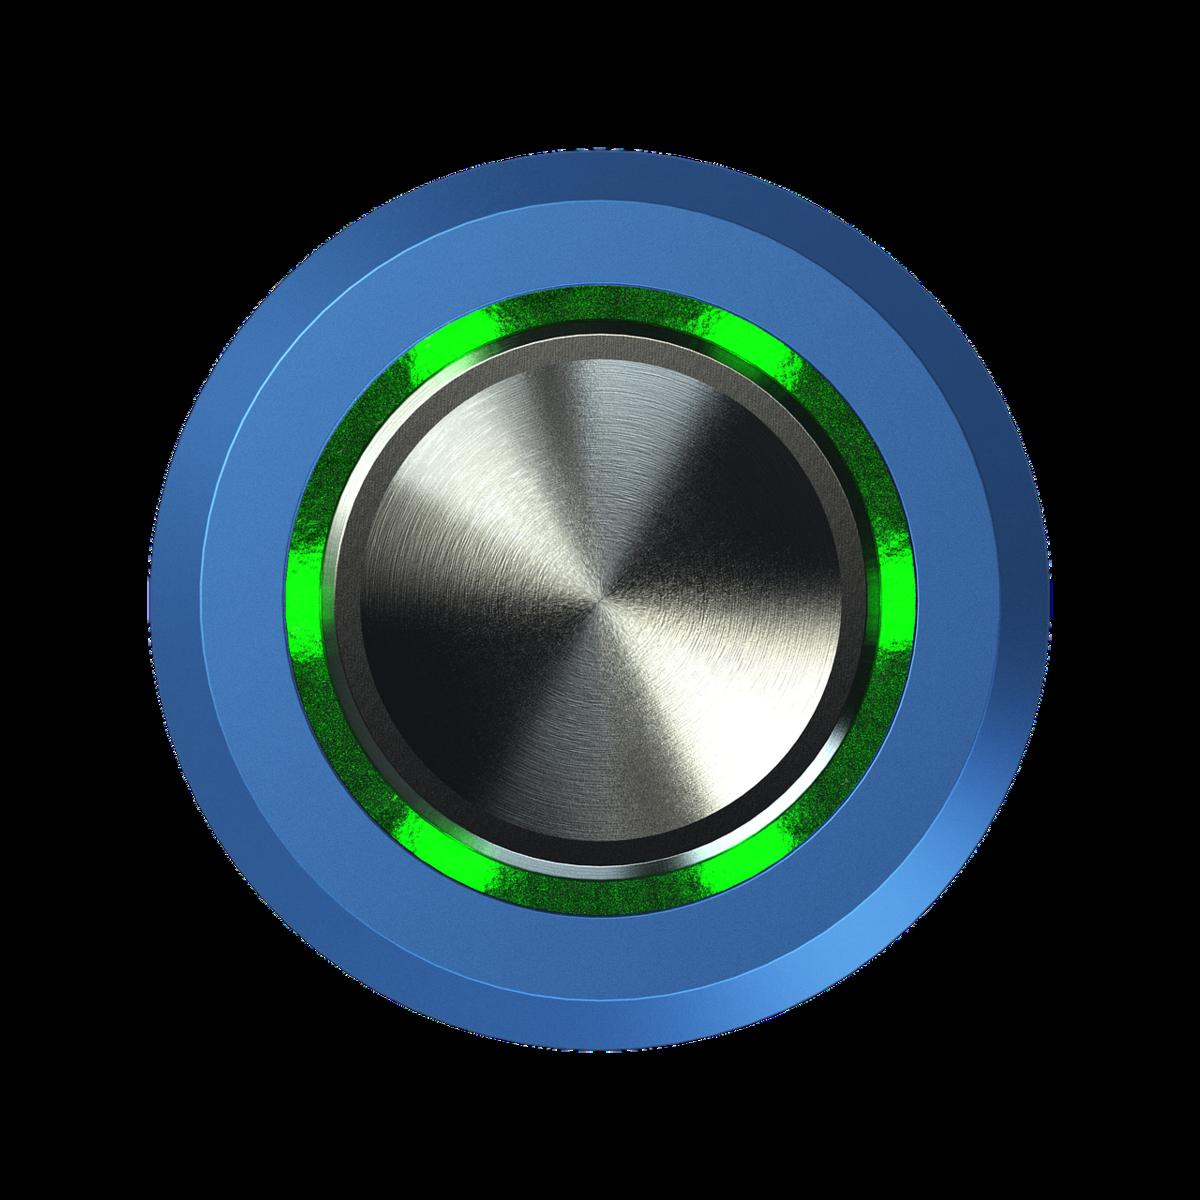 картинка для кнопки кнопка